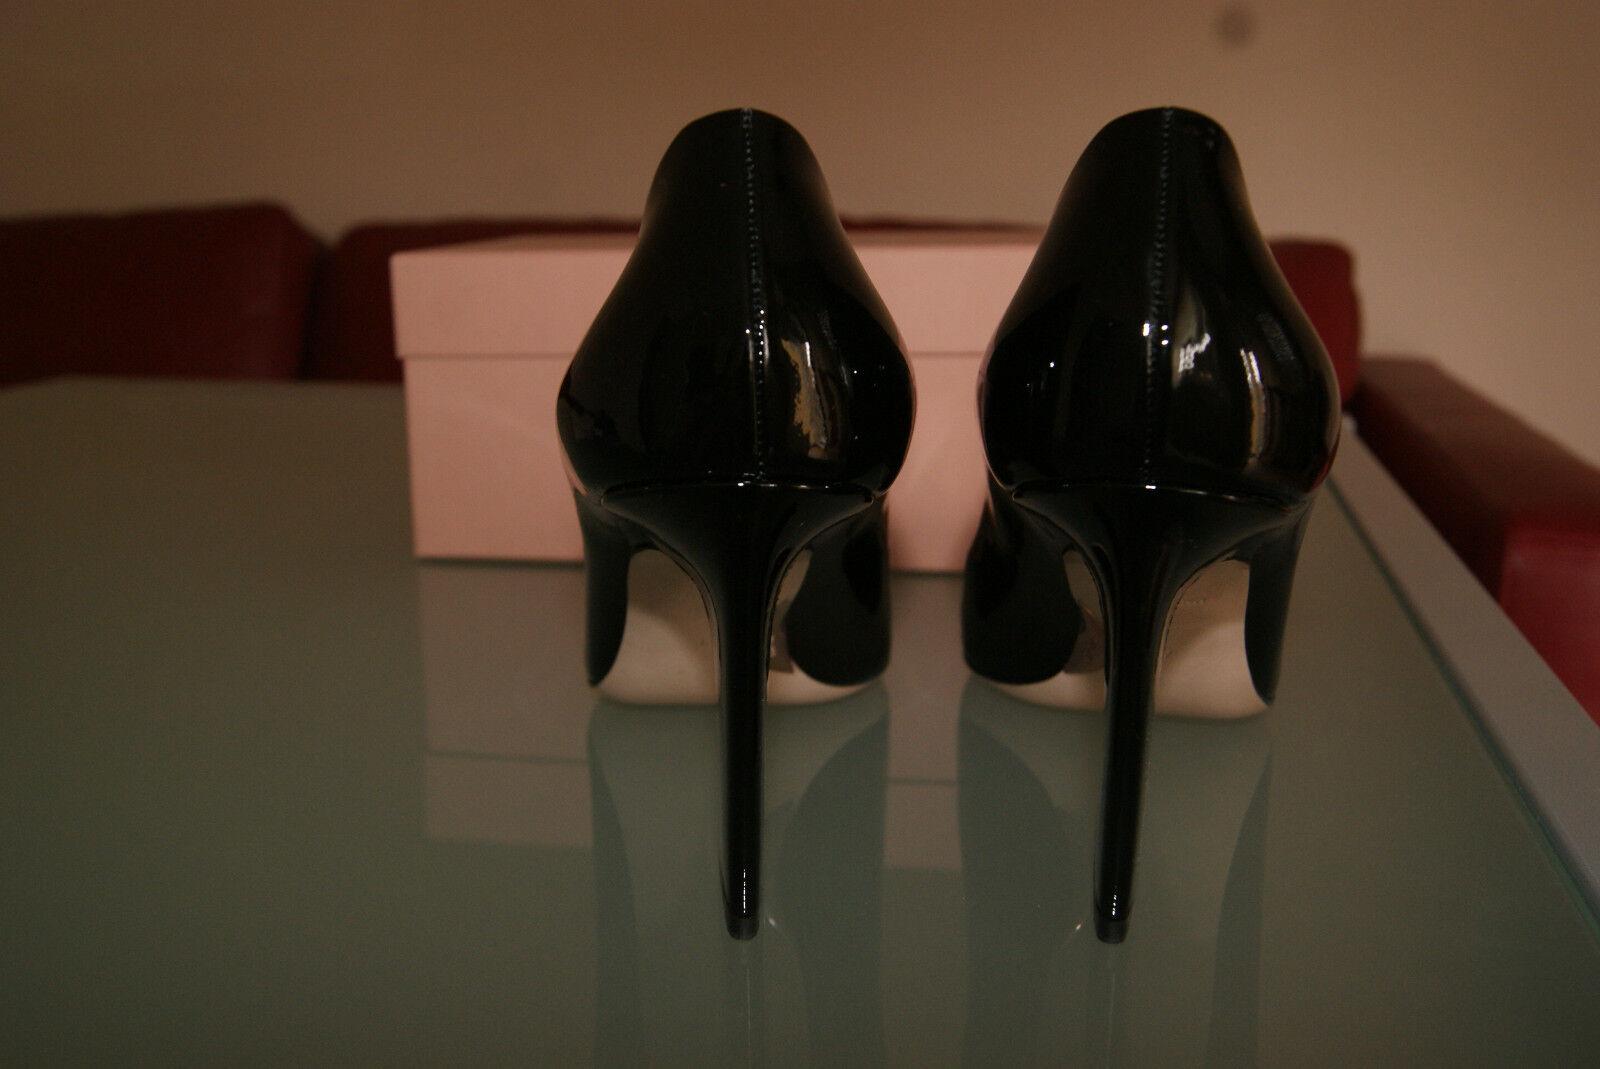 MIU MIU by PRADA Pumps Gr. 41 Damenschuhe Lackleder High NEU Heels schwarz NEU High f19704